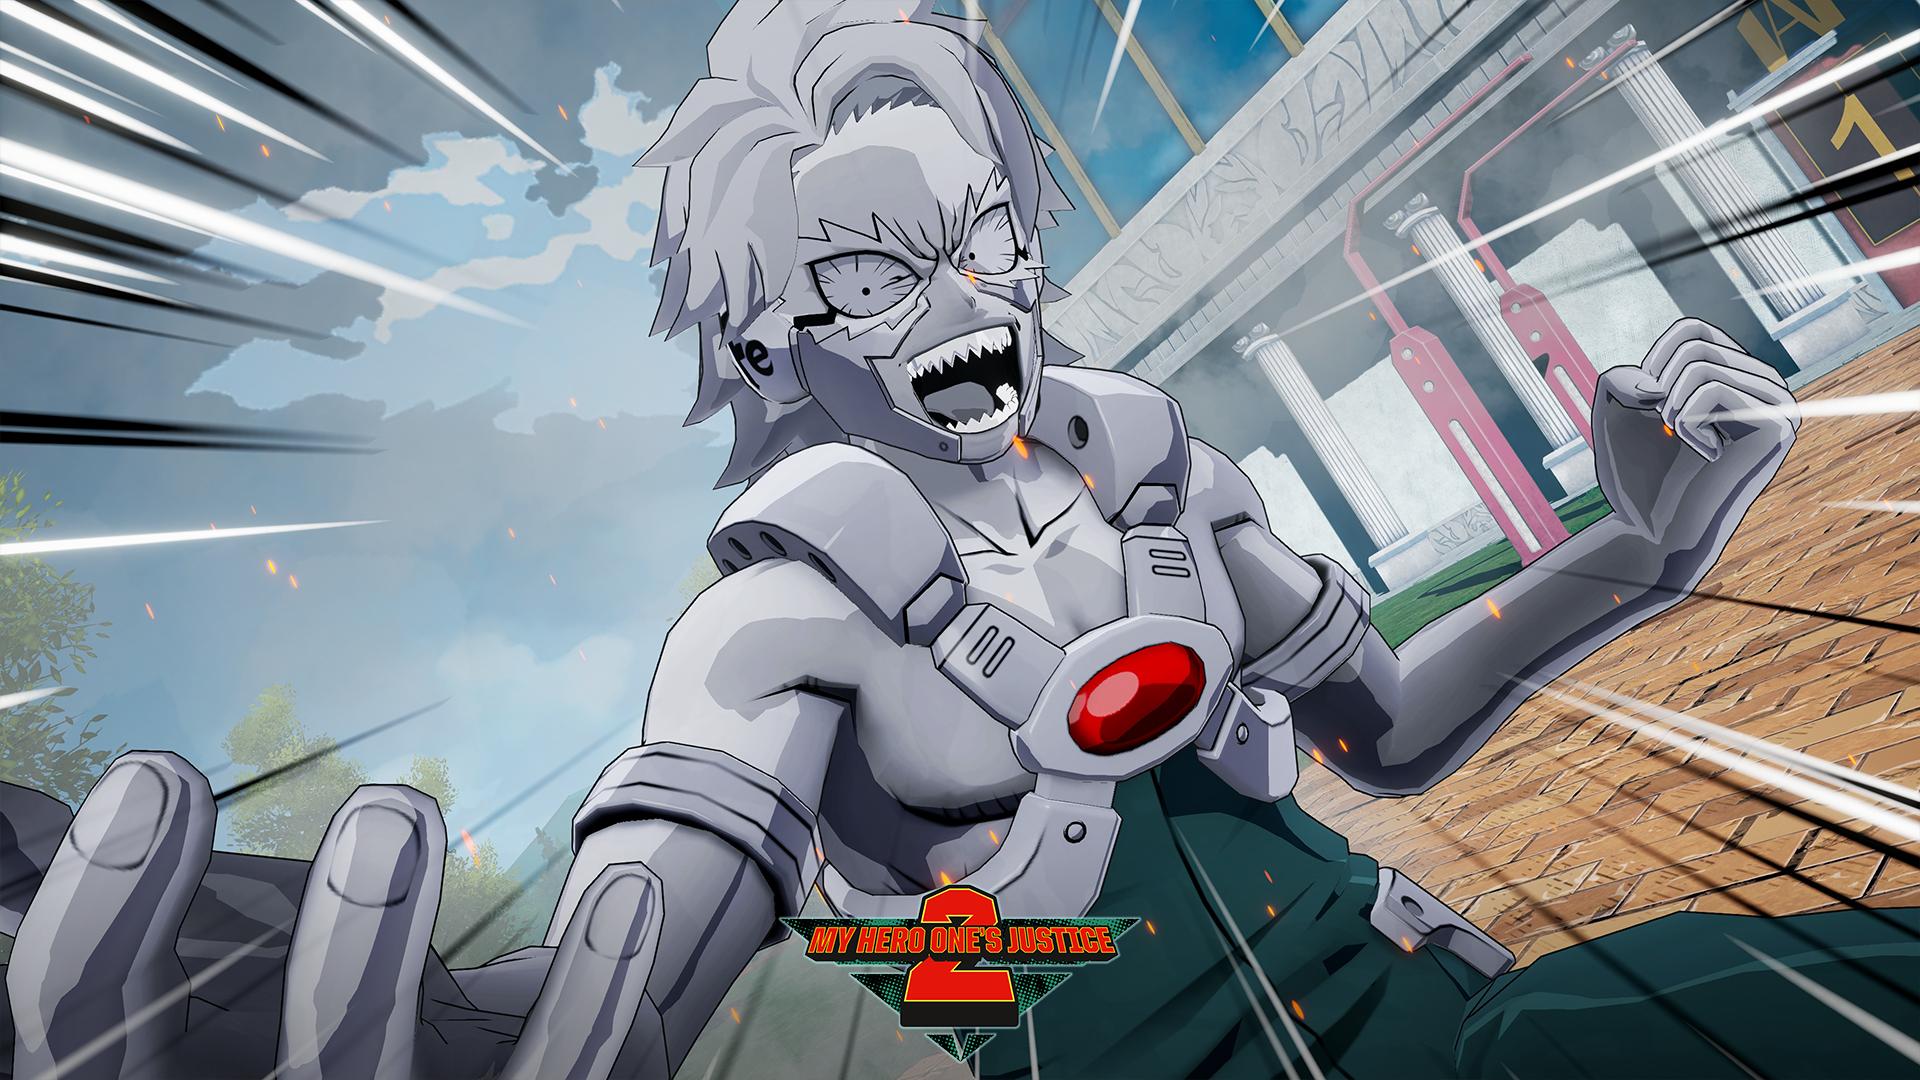 Tetsutetsu My Hero One's Justice 2